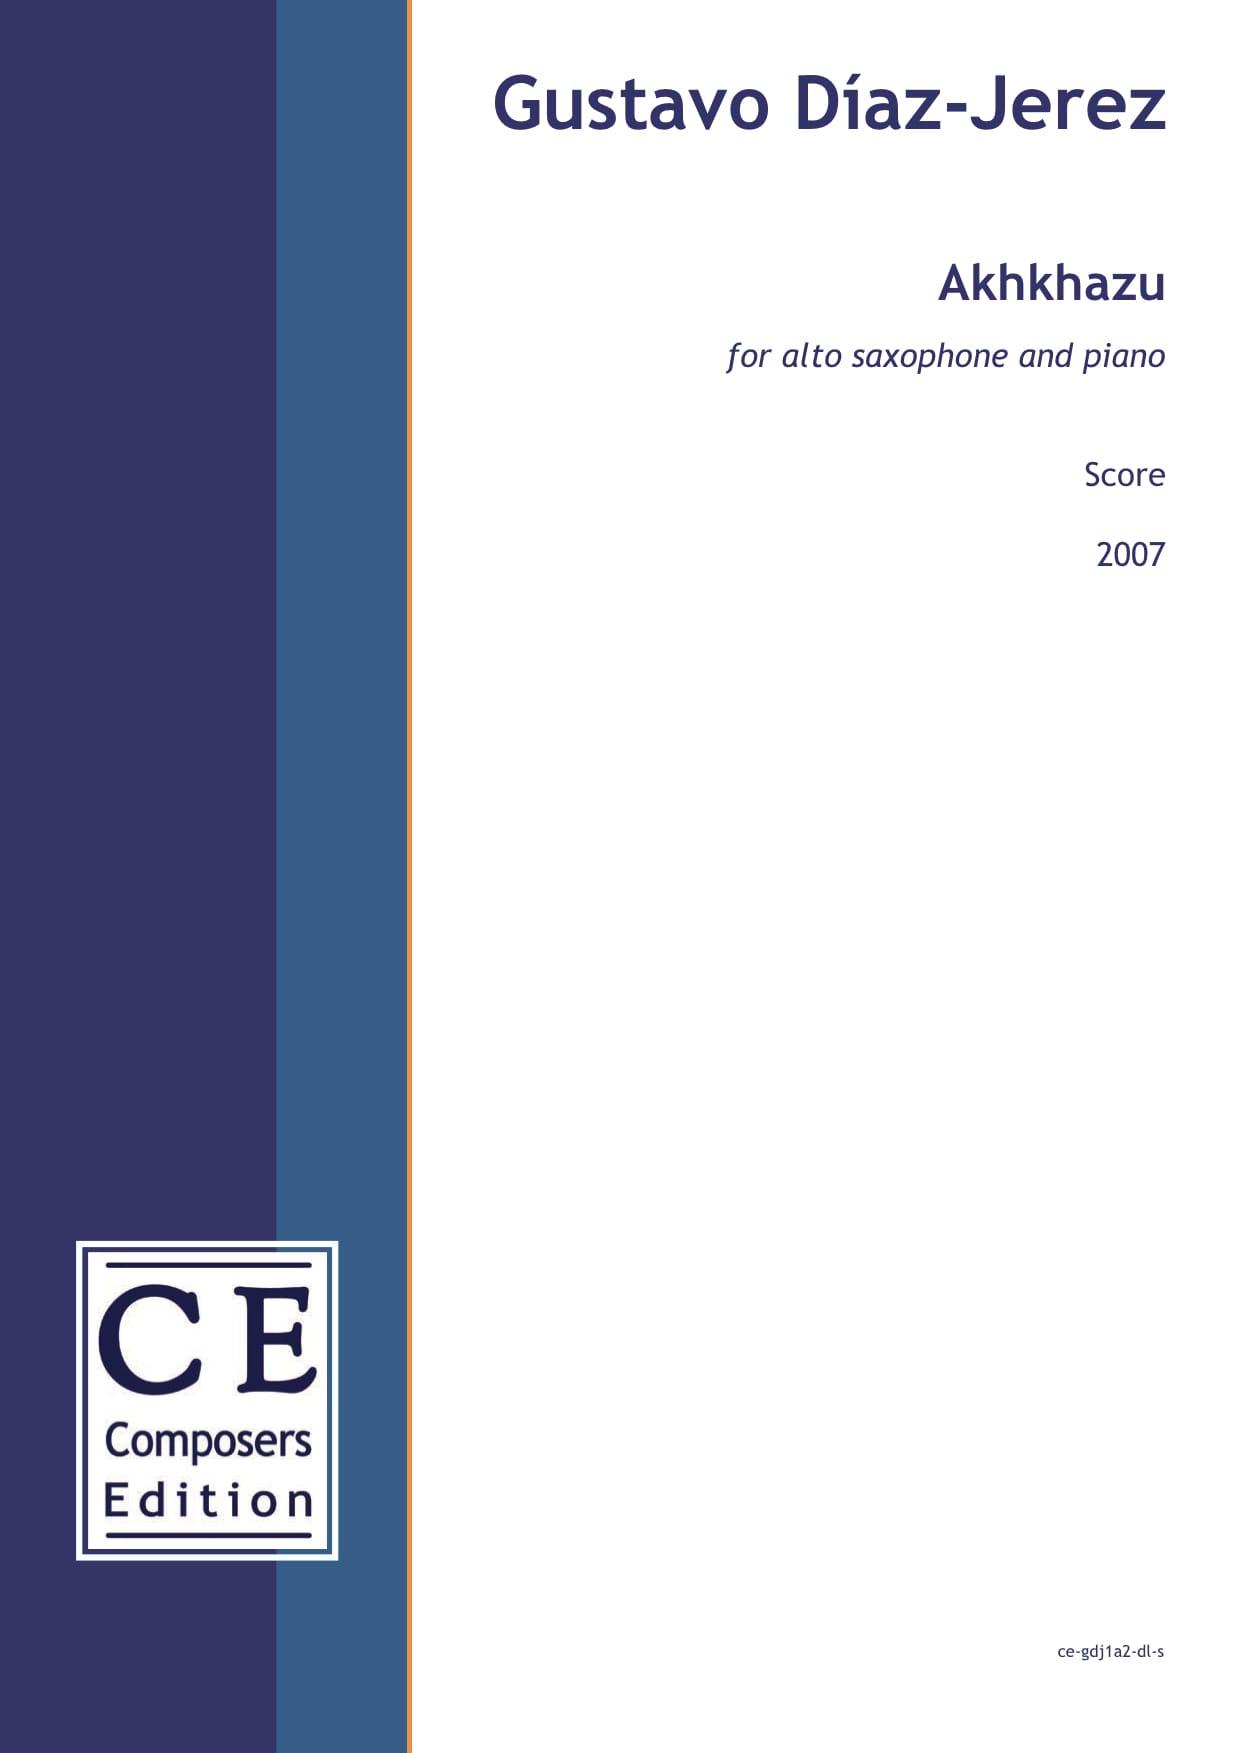 Gustavo Diaz-Jerez: Akhkhazu for alto saxophone and piano